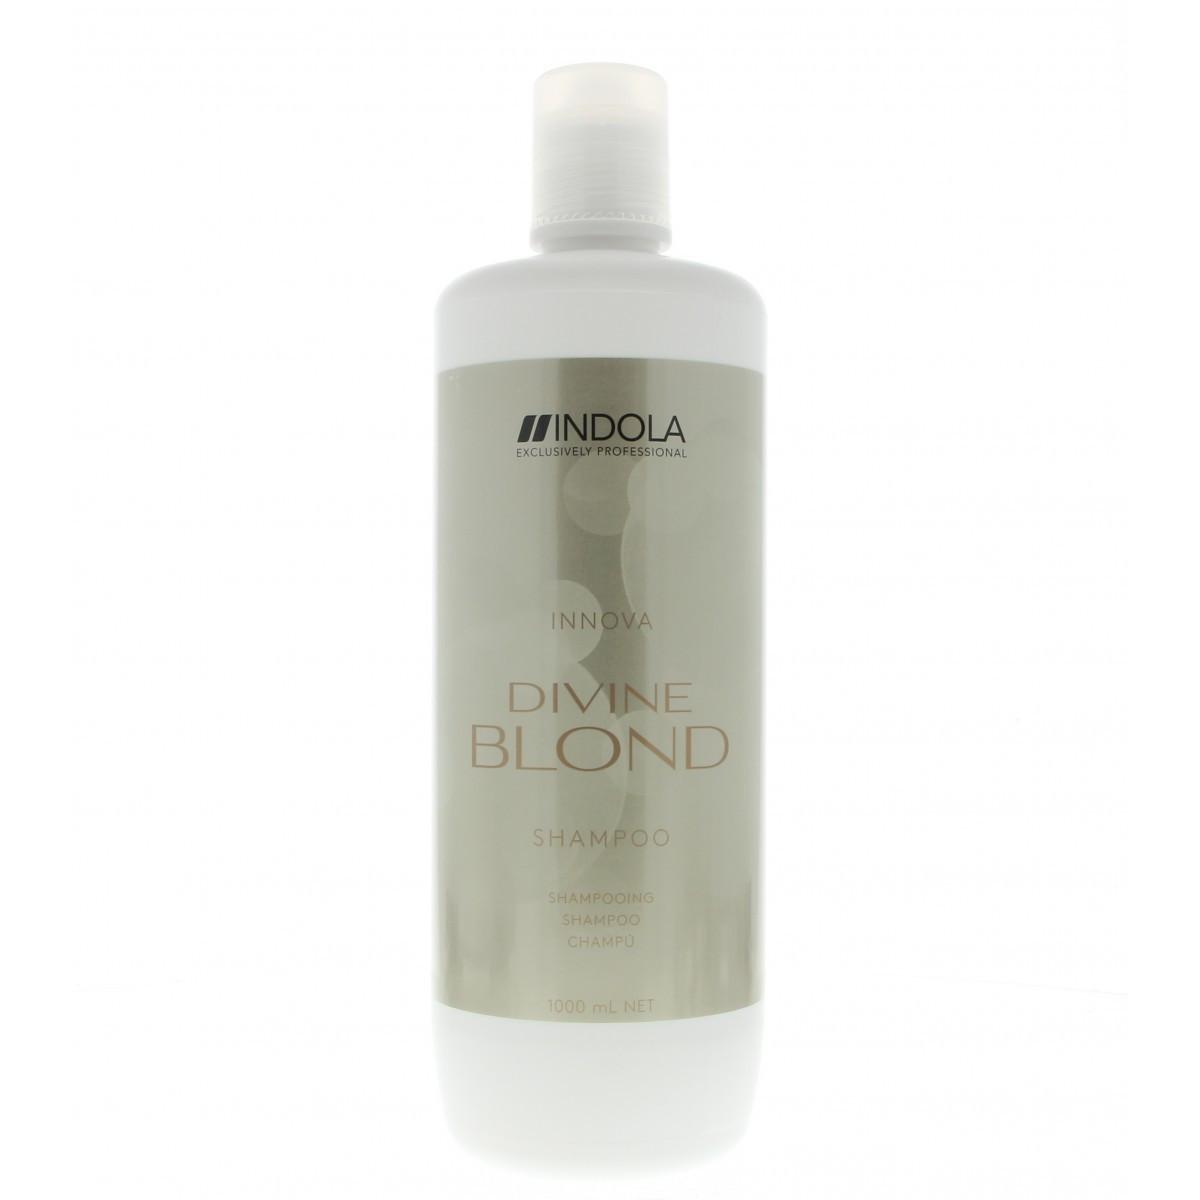 Indola Divine Blond Shampoo шампунь для светлых волос, 1000 мл